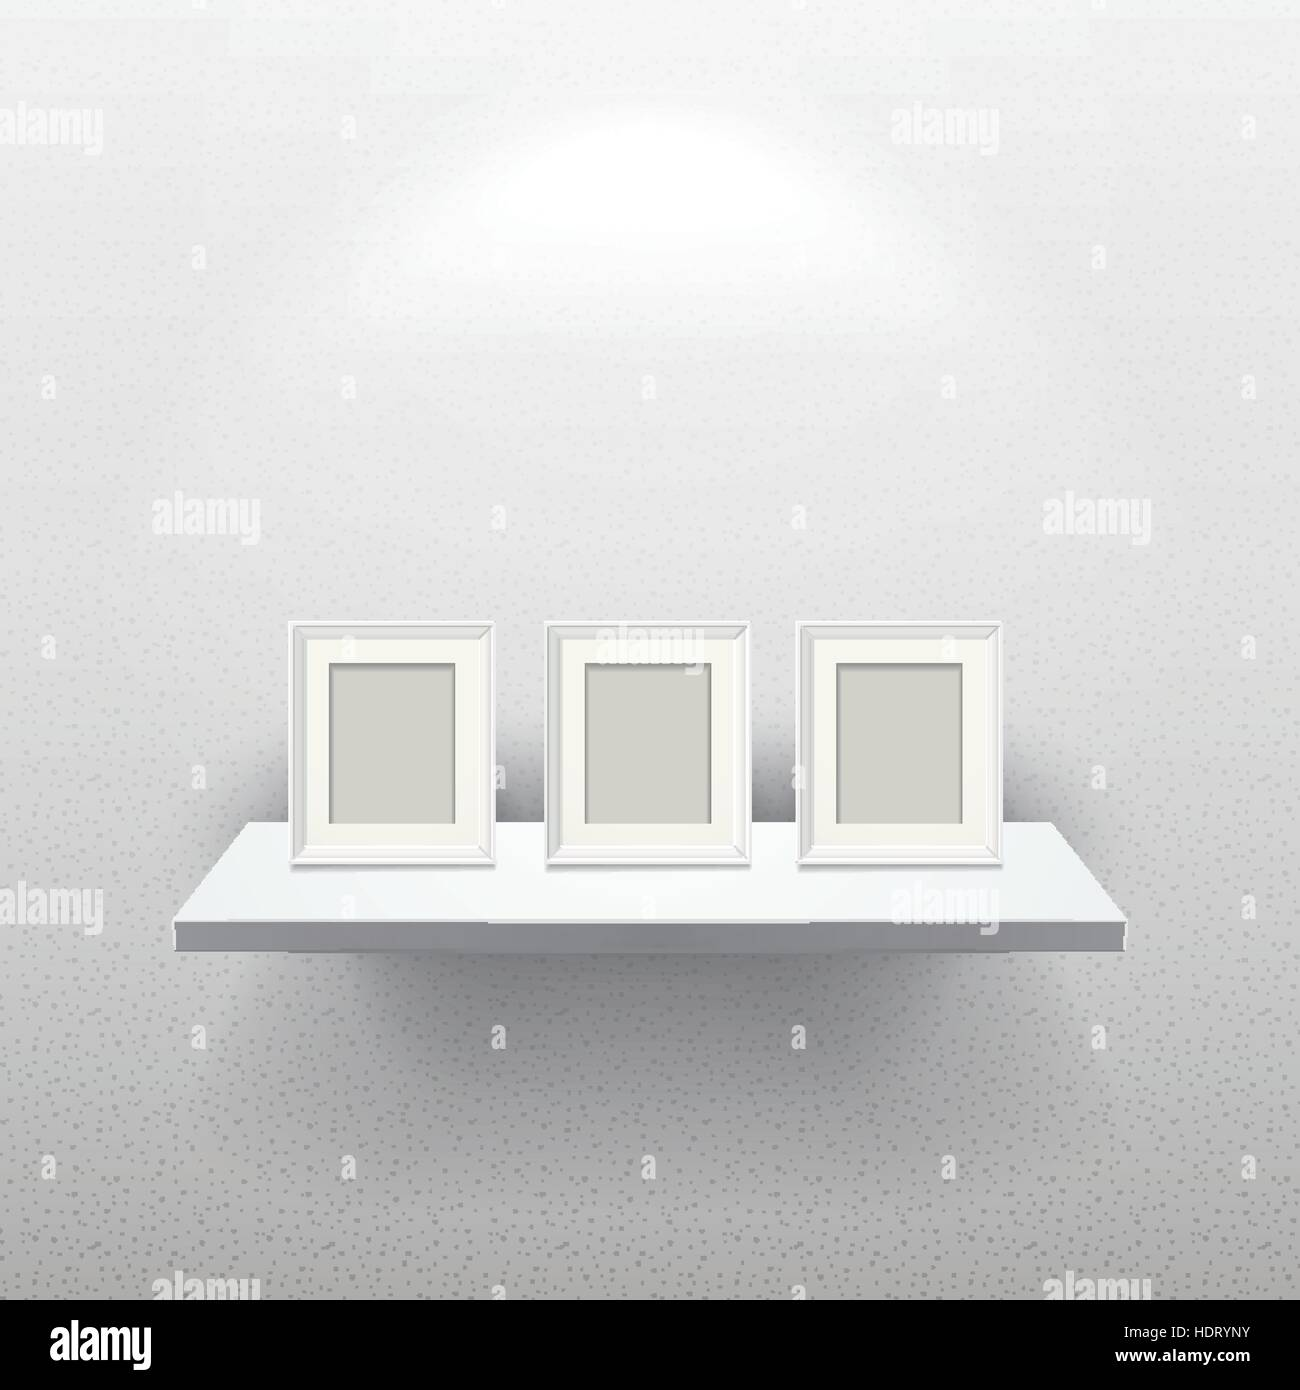 Photo Frames Shelf Stockfotos & Photo Frames Shelf Bilder - Alamy